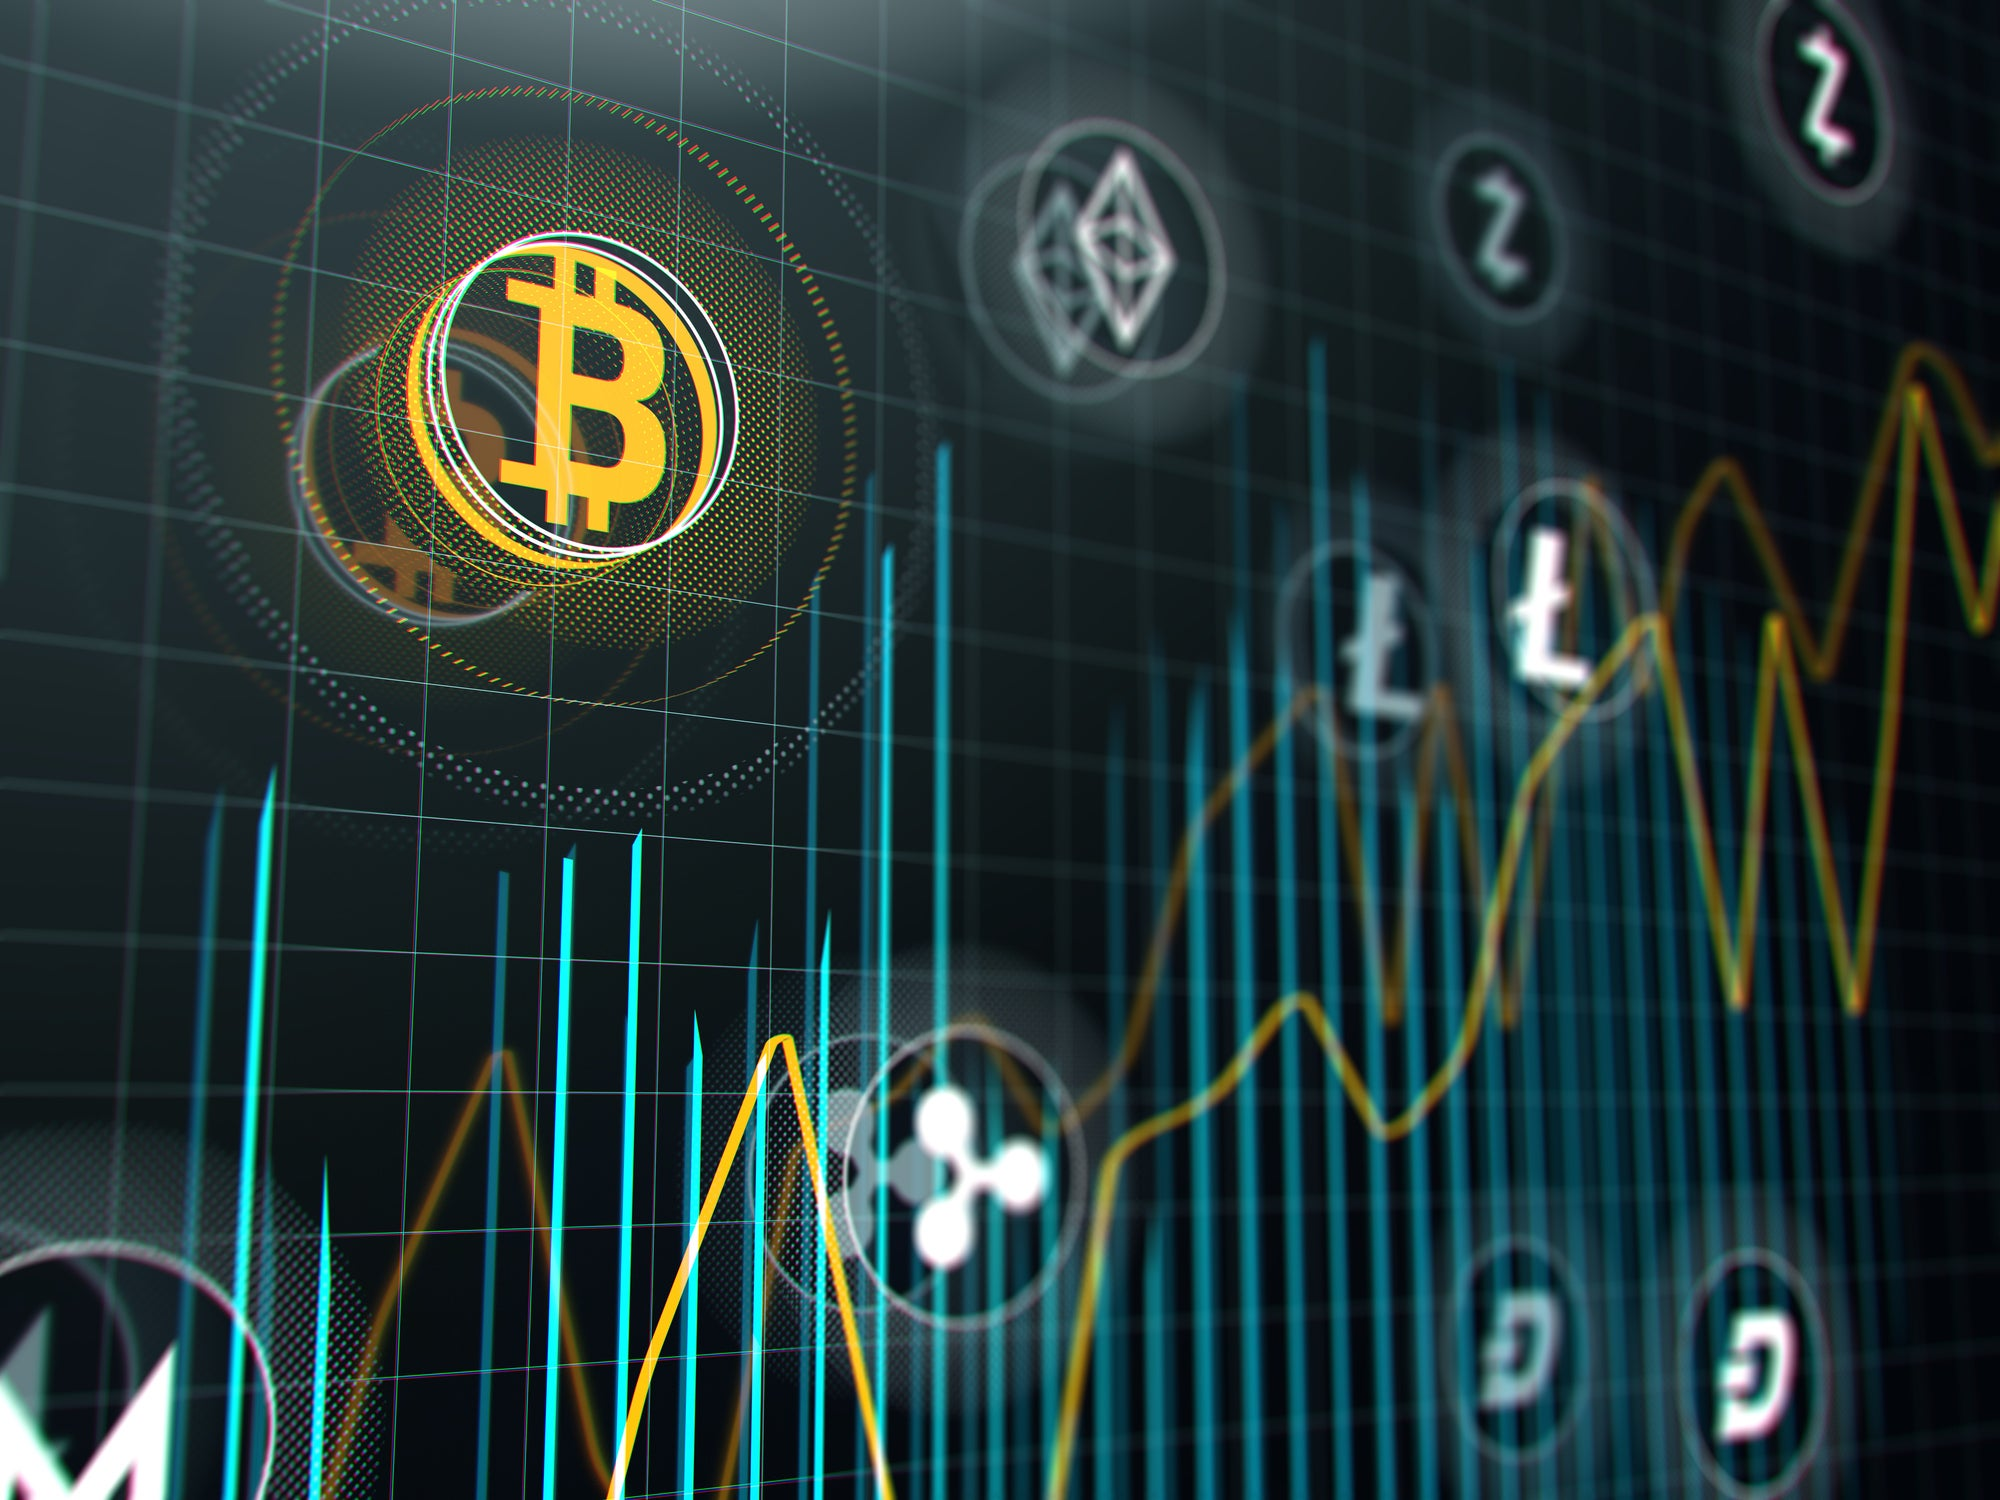 Peningkatan Harga dari Aset Kripto | Koran crypto